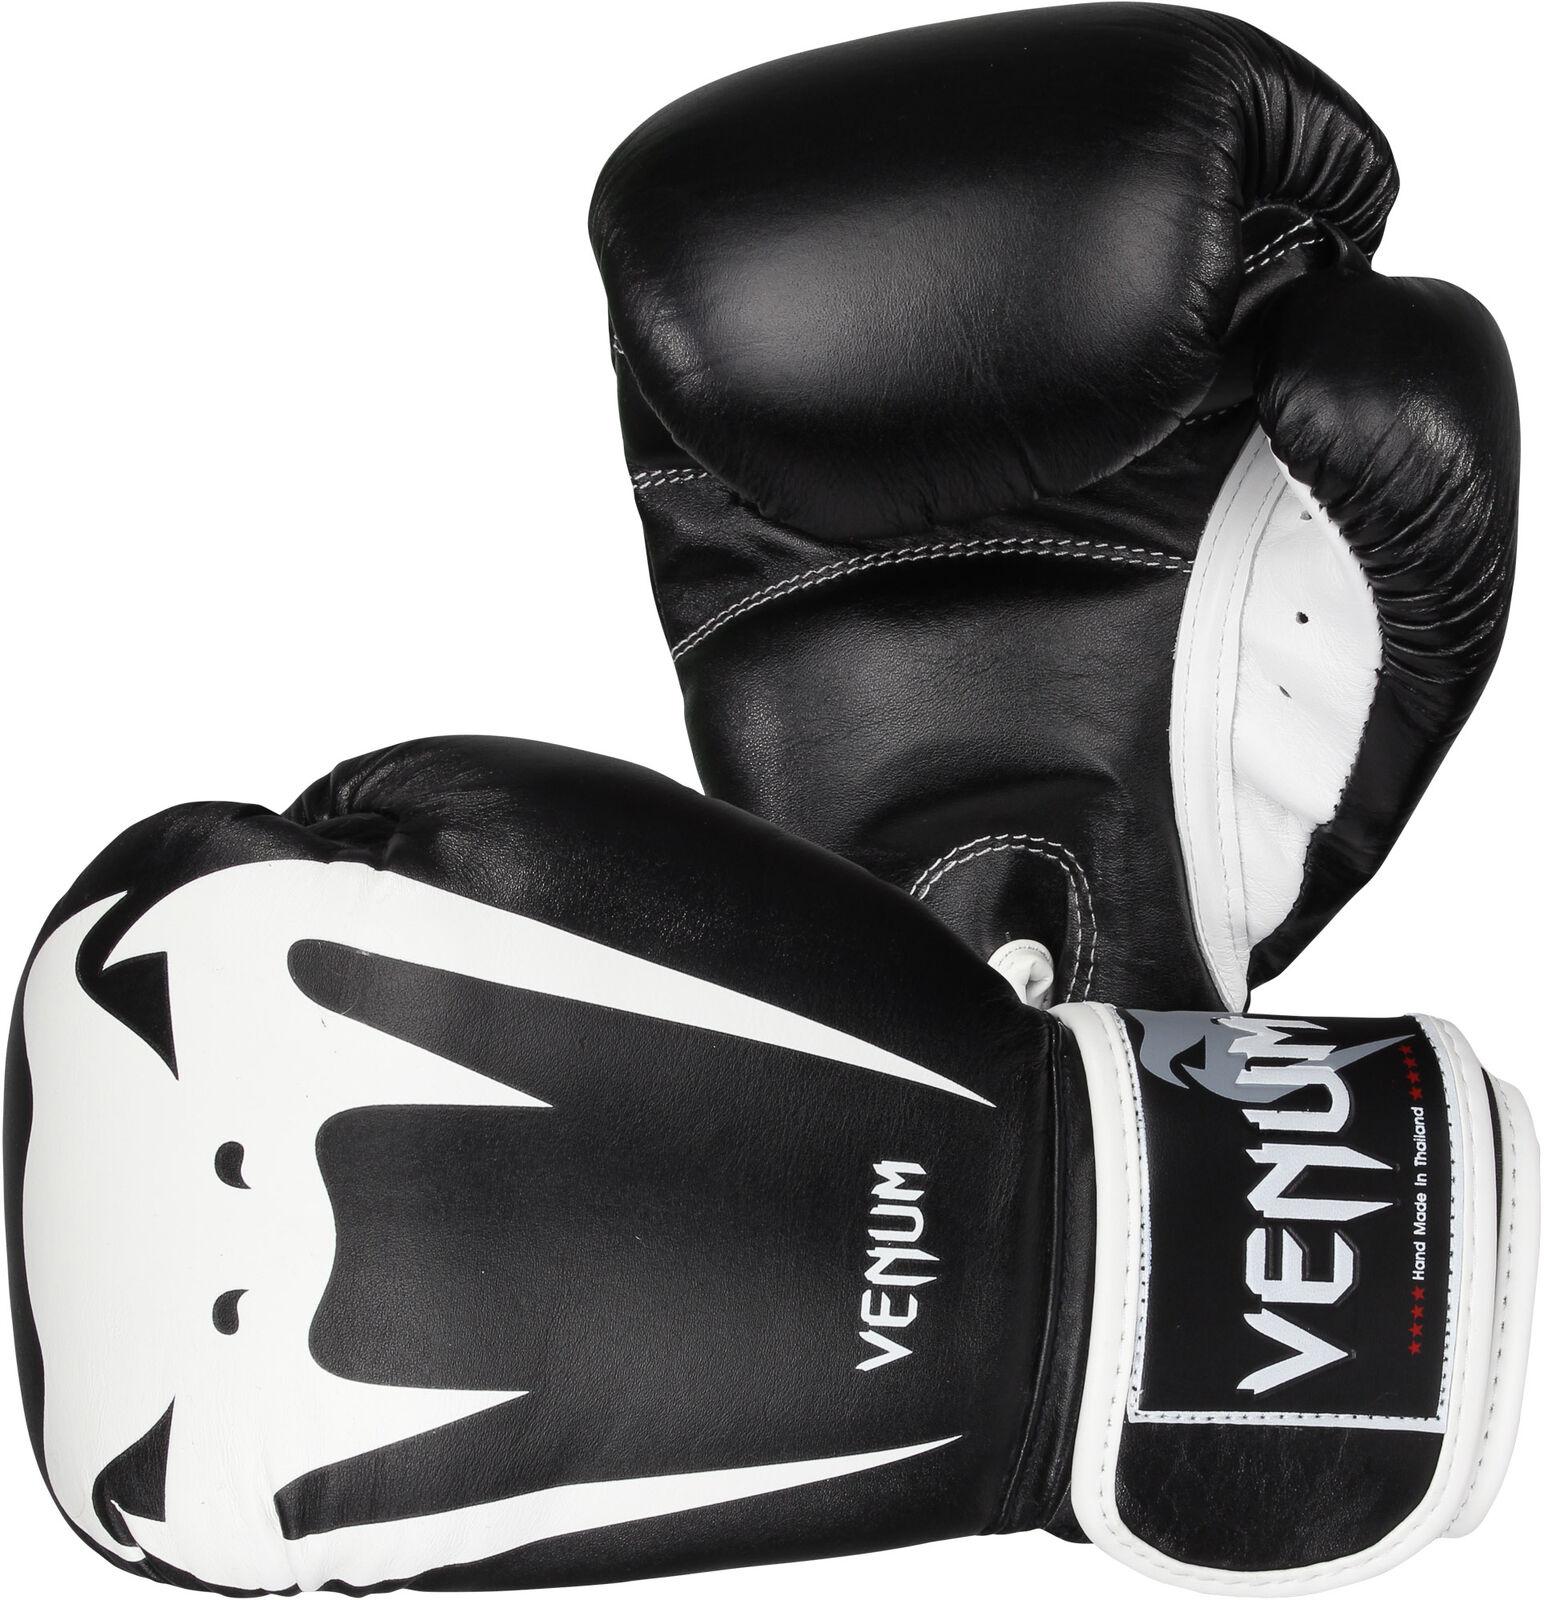 Venum Boxhandschuhe Giant 1.0 Boxhandschuhe Venum (Schwarz/Weiß) - 296ml 36f7c0